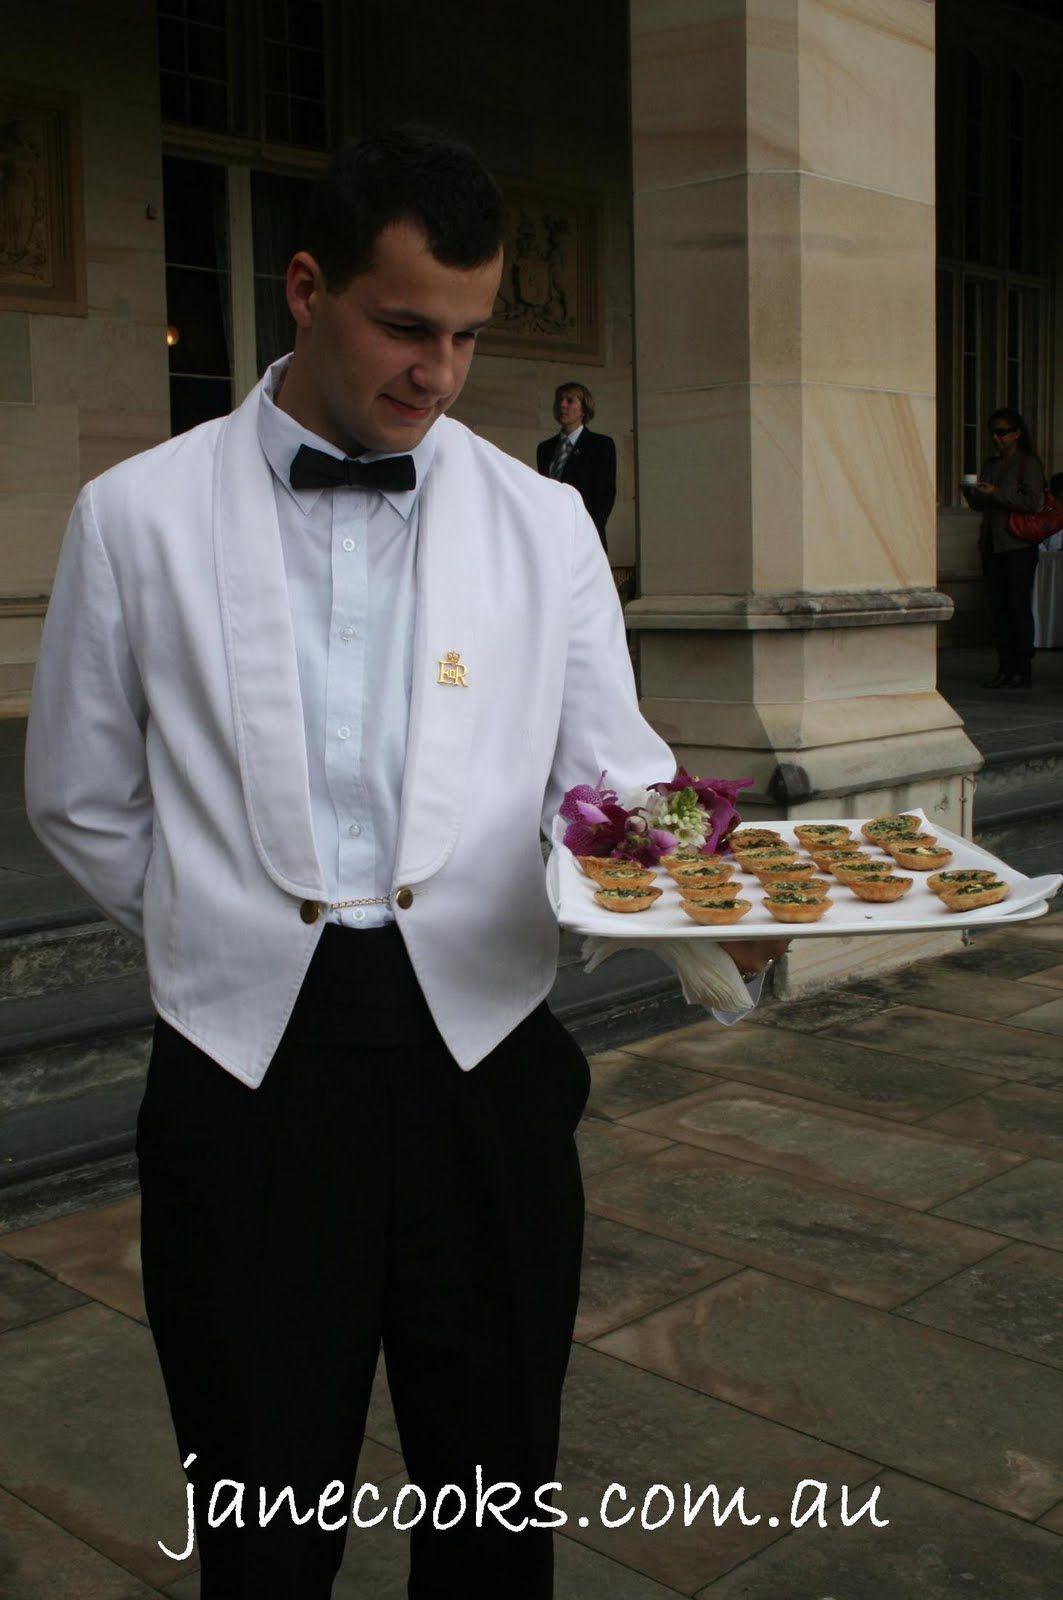 Fine Dining Restaurant Uniforms